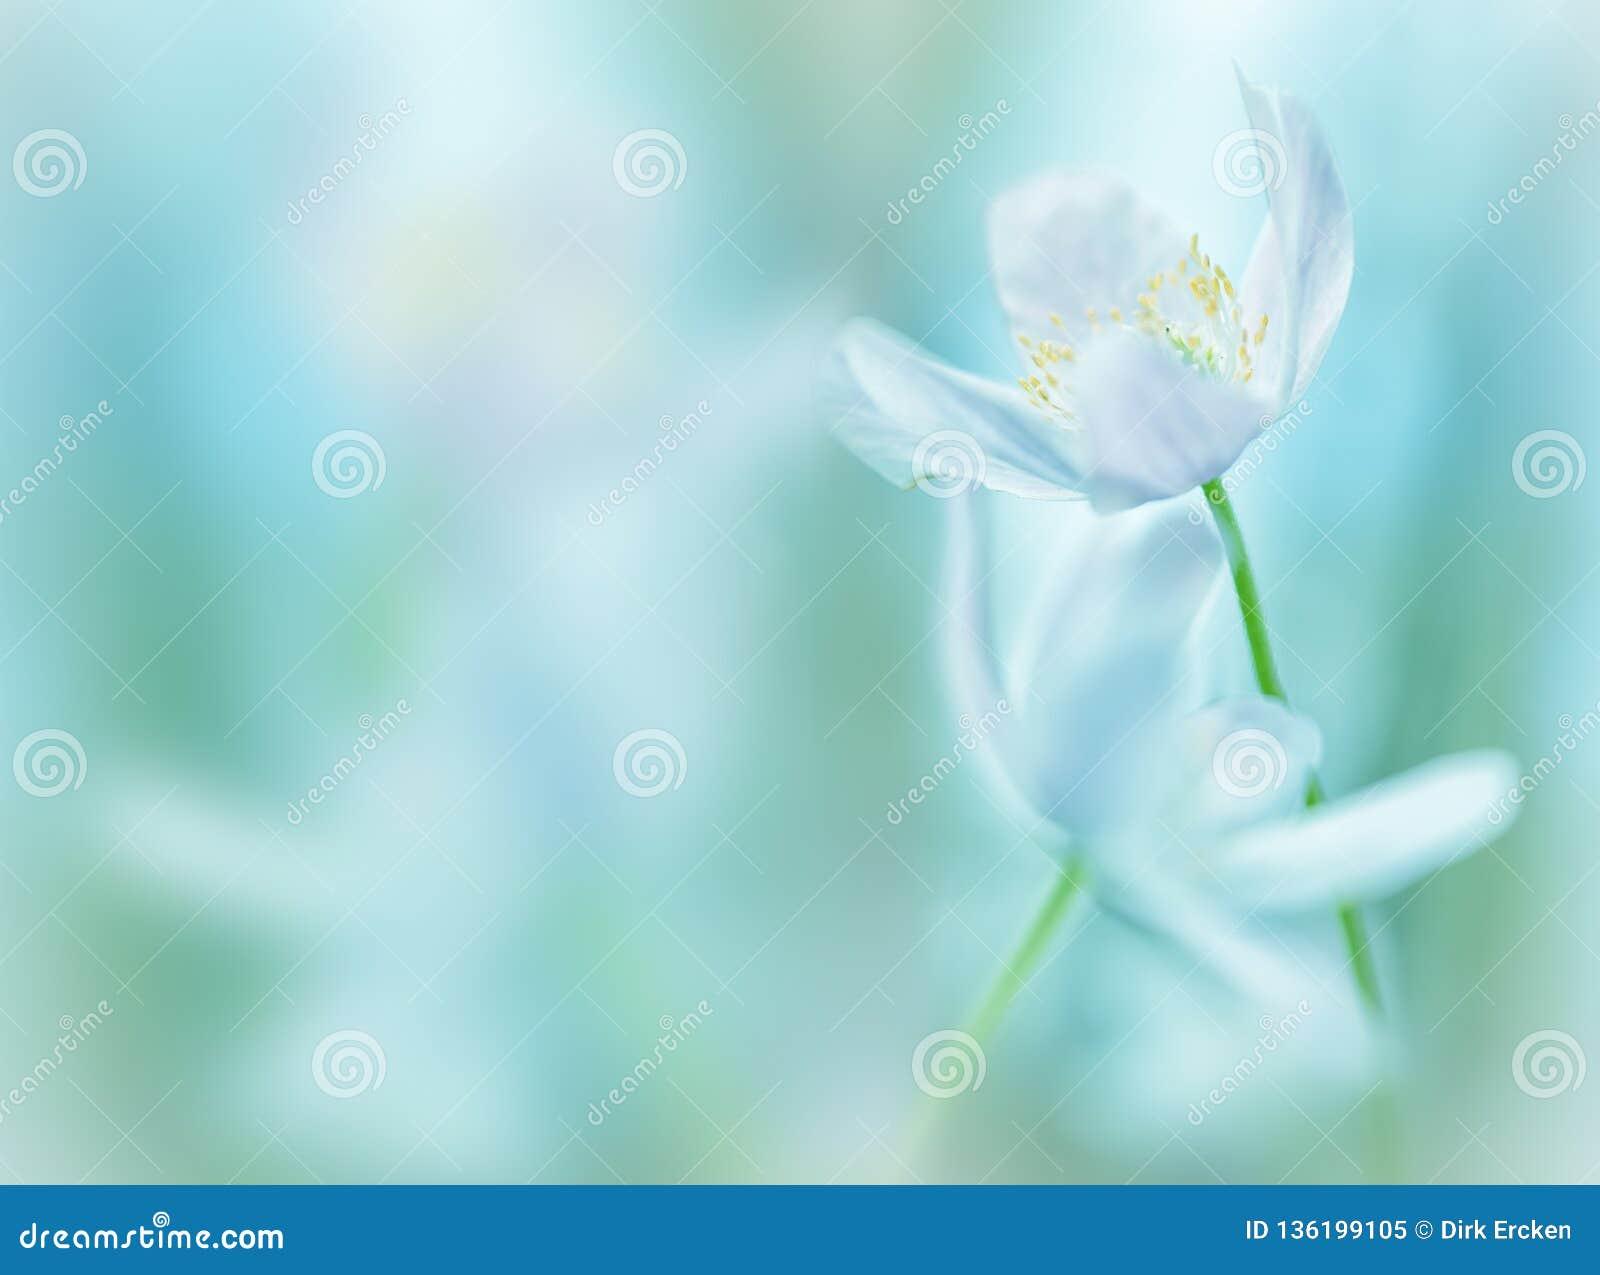 Wood anemone background. White wildflowers shallow depth